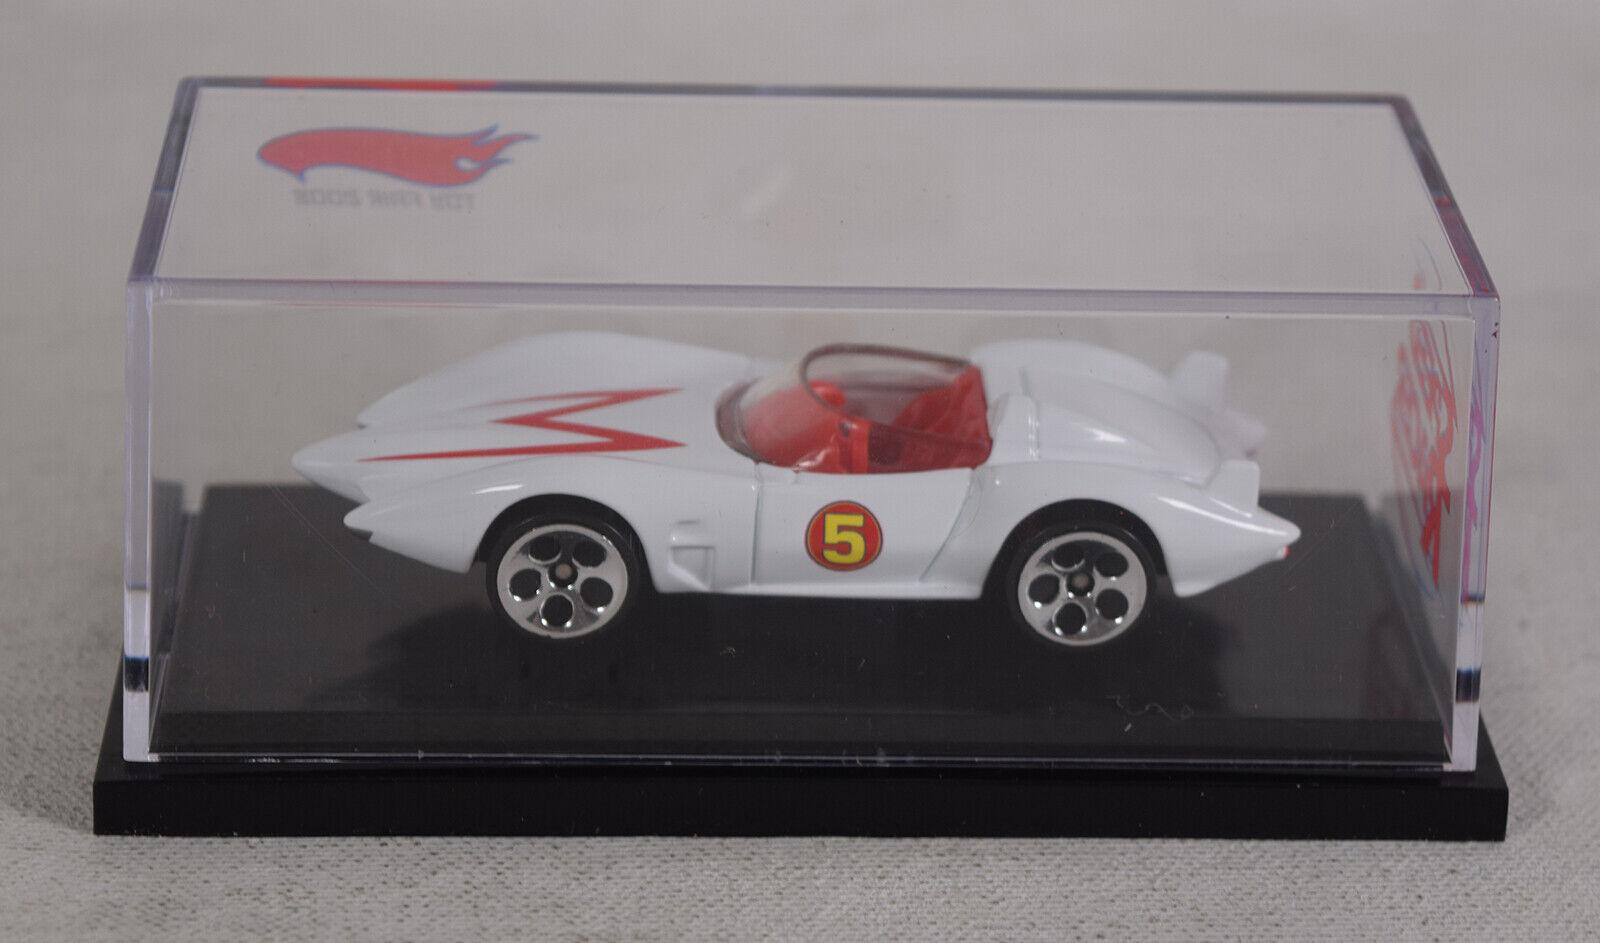 Hot Wheels TOY FAIR 2008 SPEED RACER match 5 Limited Edition Mattel